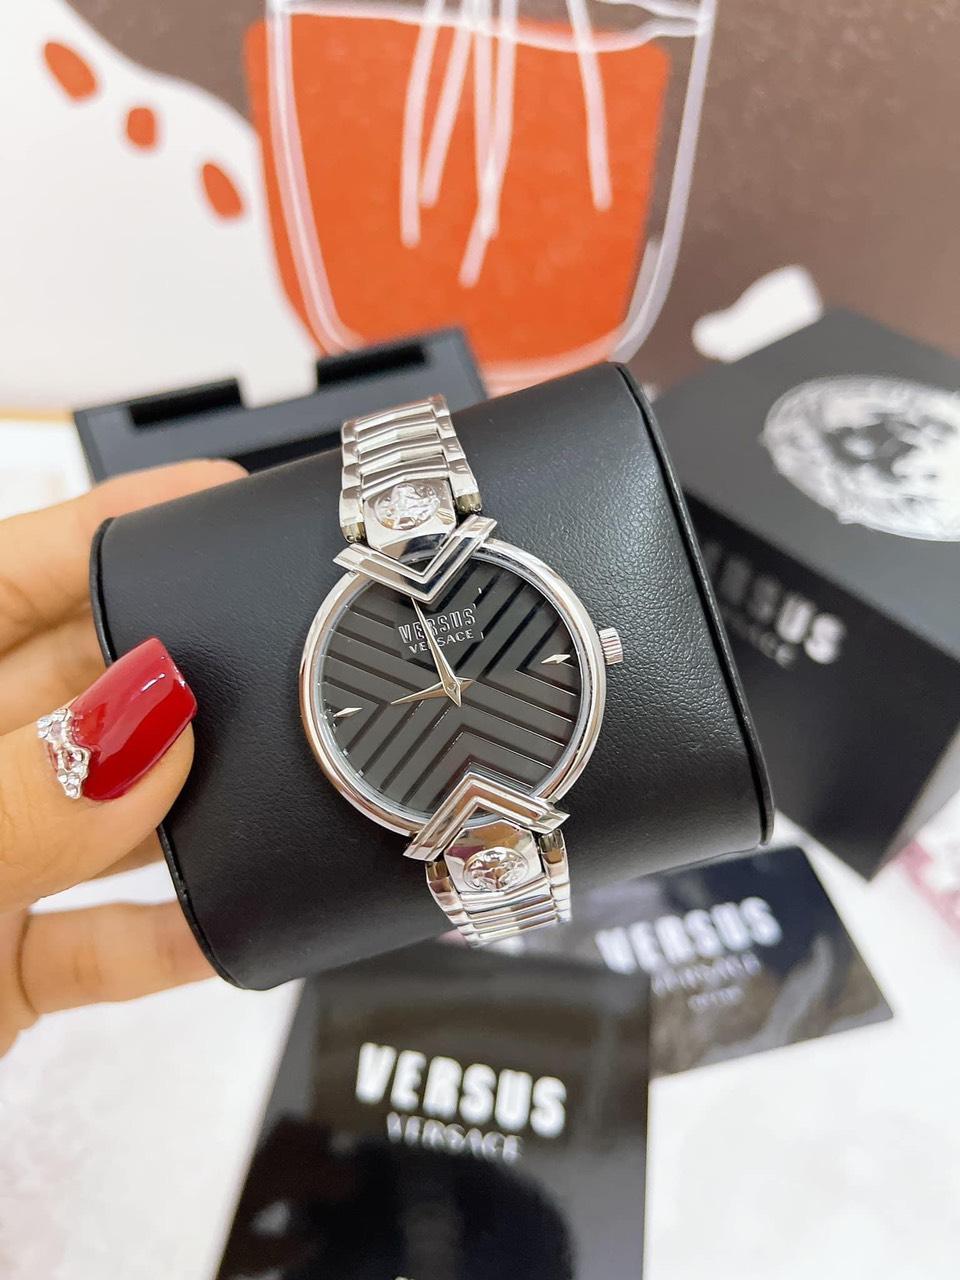 Đồng hồ hãng VERSUS Mabillon silver mặt đen